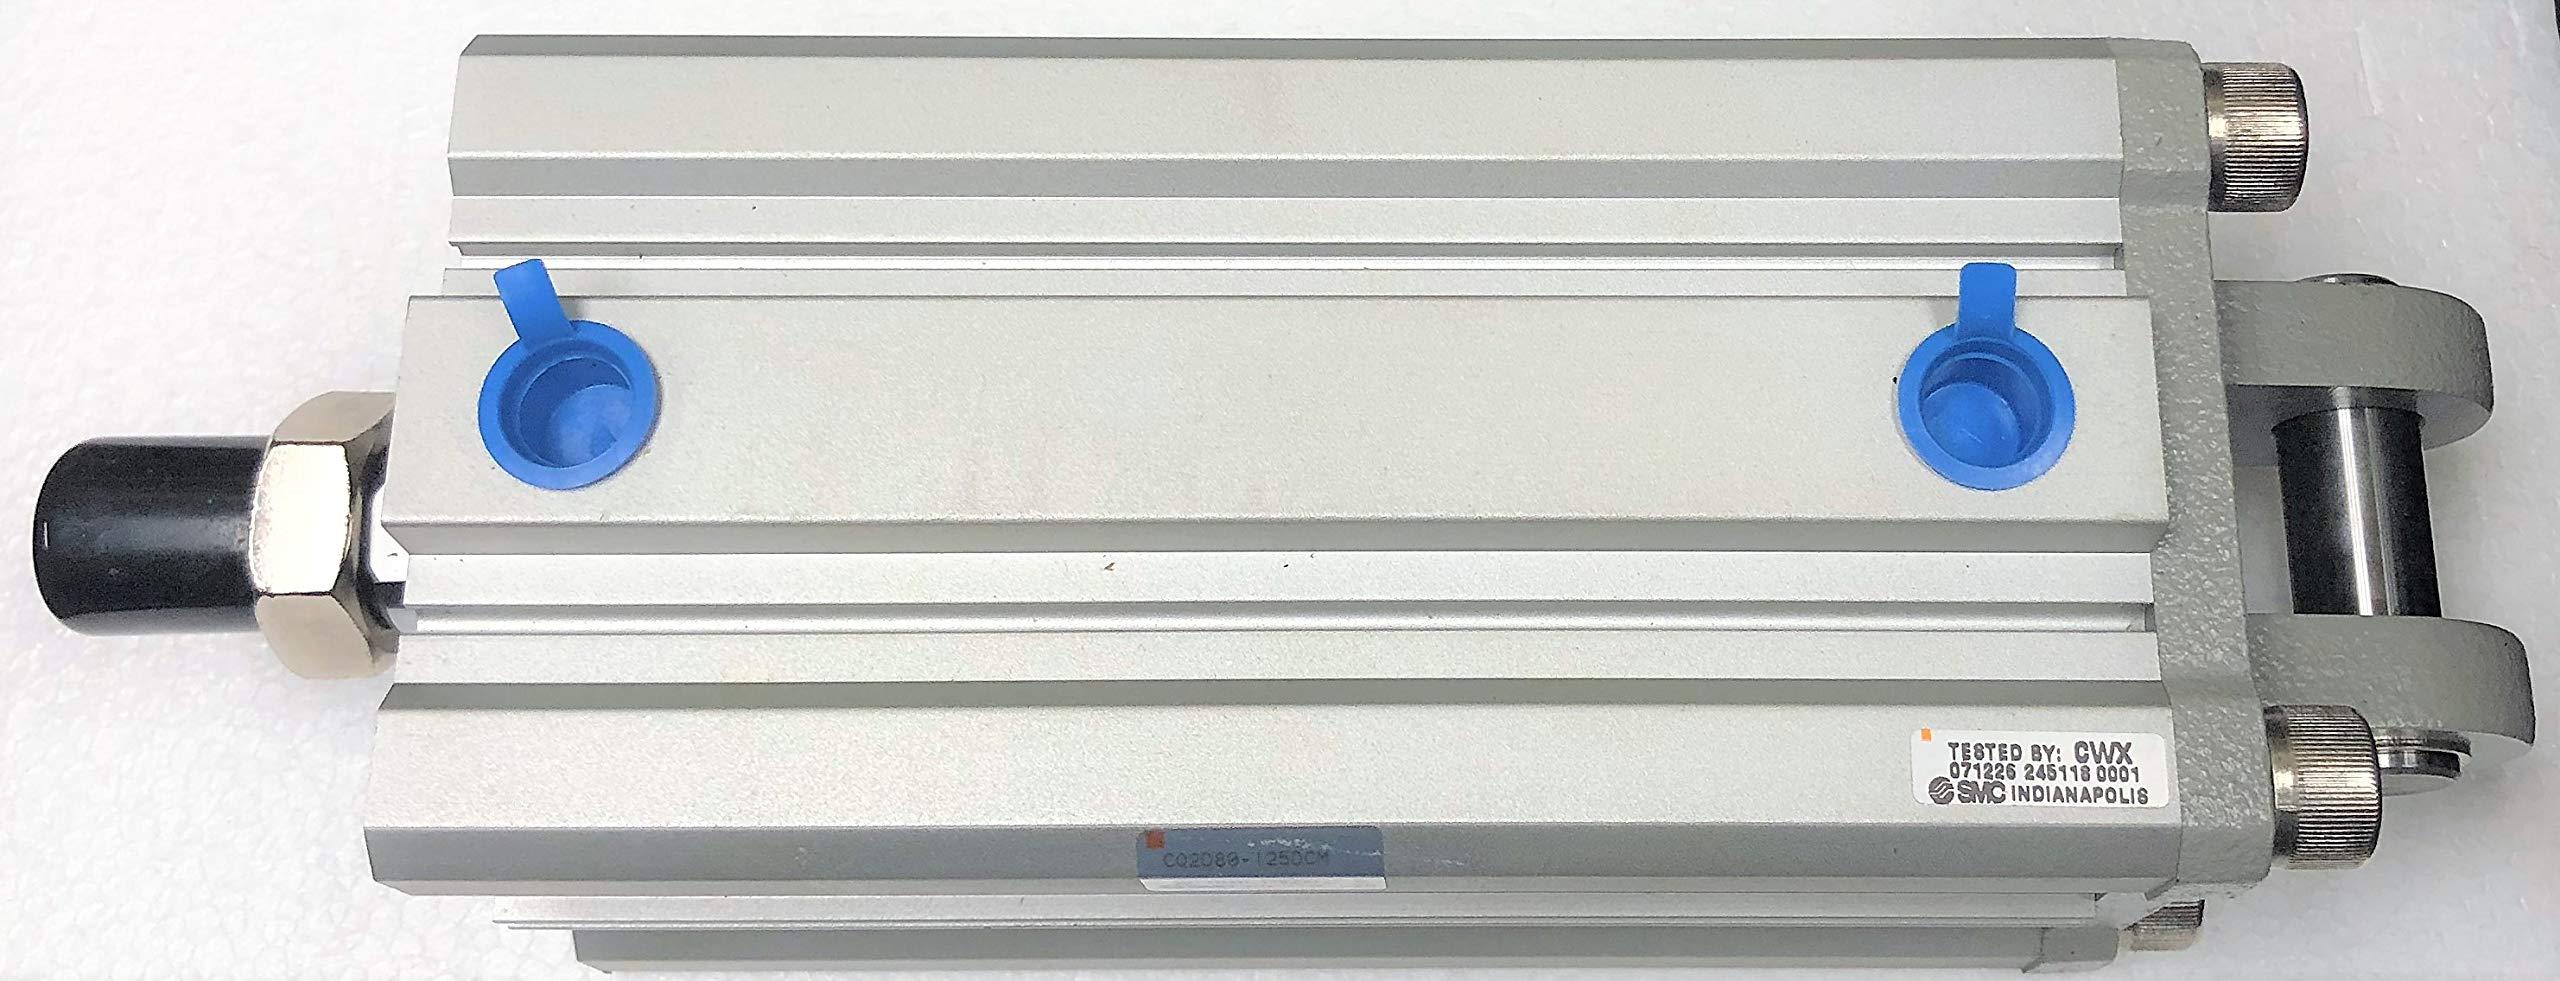 SMC Corporation CQ2D80-125DCM Compact Air Pneumatic Cylinder, Long Stroke, CQ2, 80mm Bore, 125mm Stroke